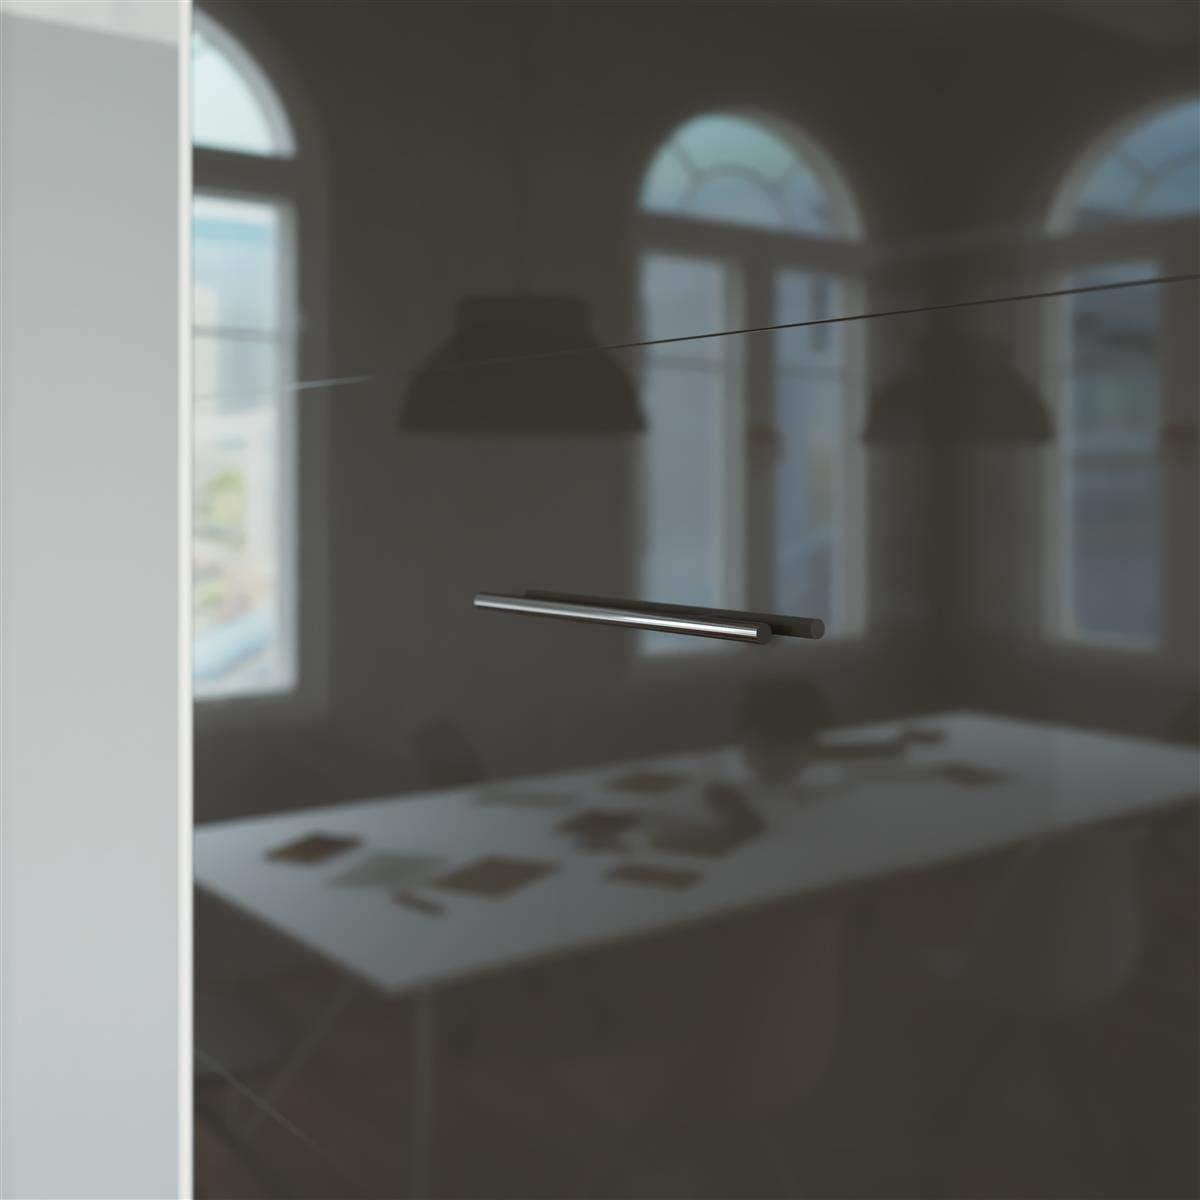 SMARTBett Basic Cama abatible Cama Plegable Cama de Pared (Blanco/Antracita Brillante, 90 x 200 cm Vertical)